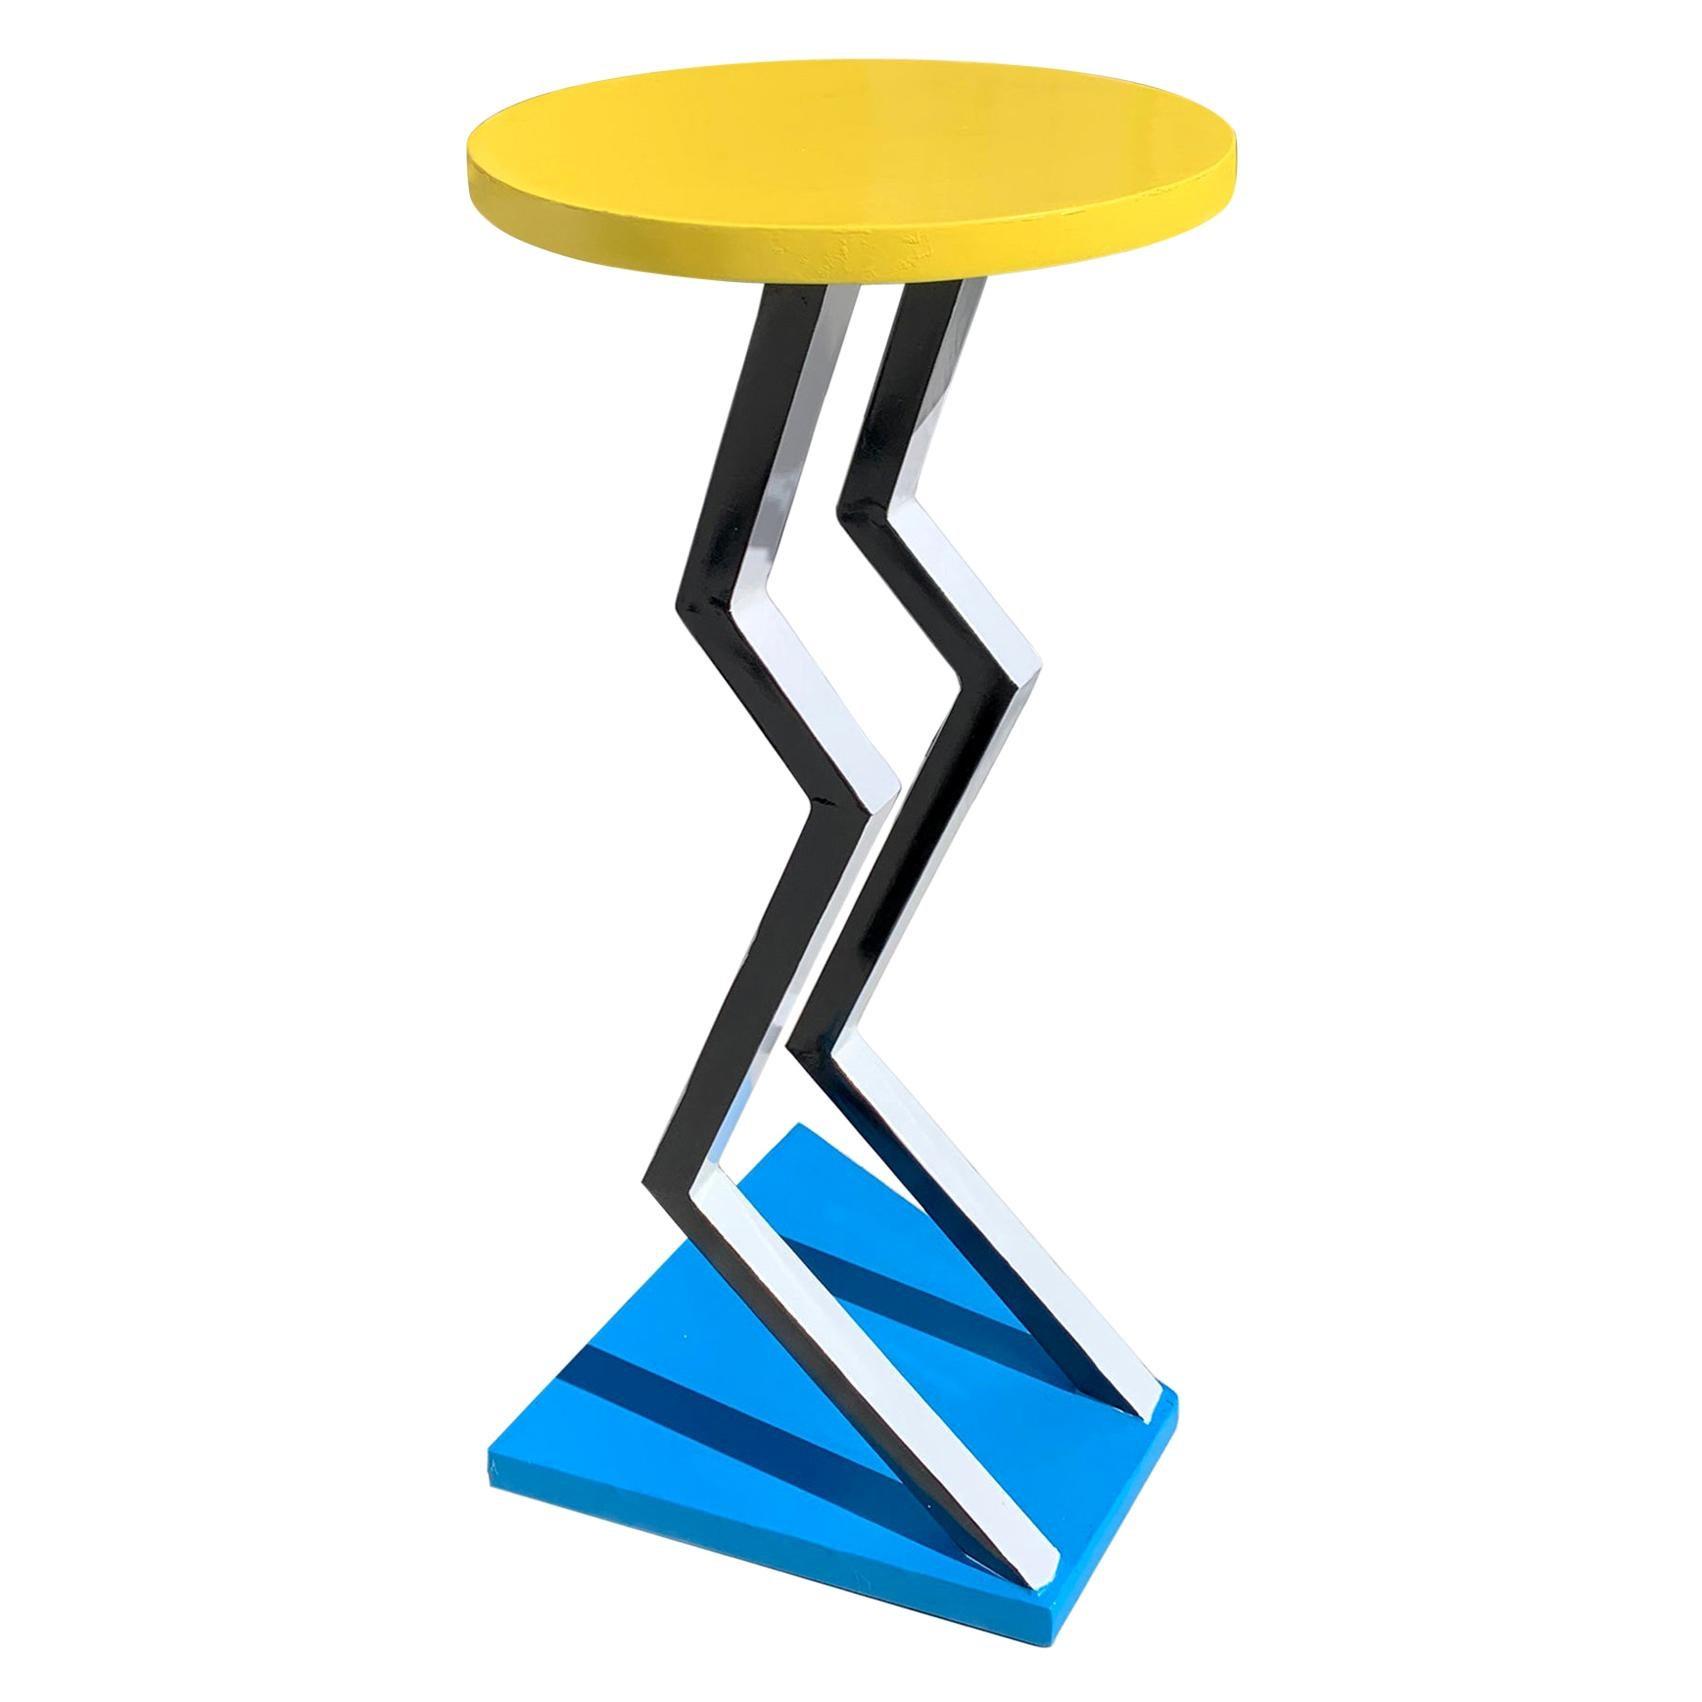 Postmodern Michele De Lucci Style Pedestal Table